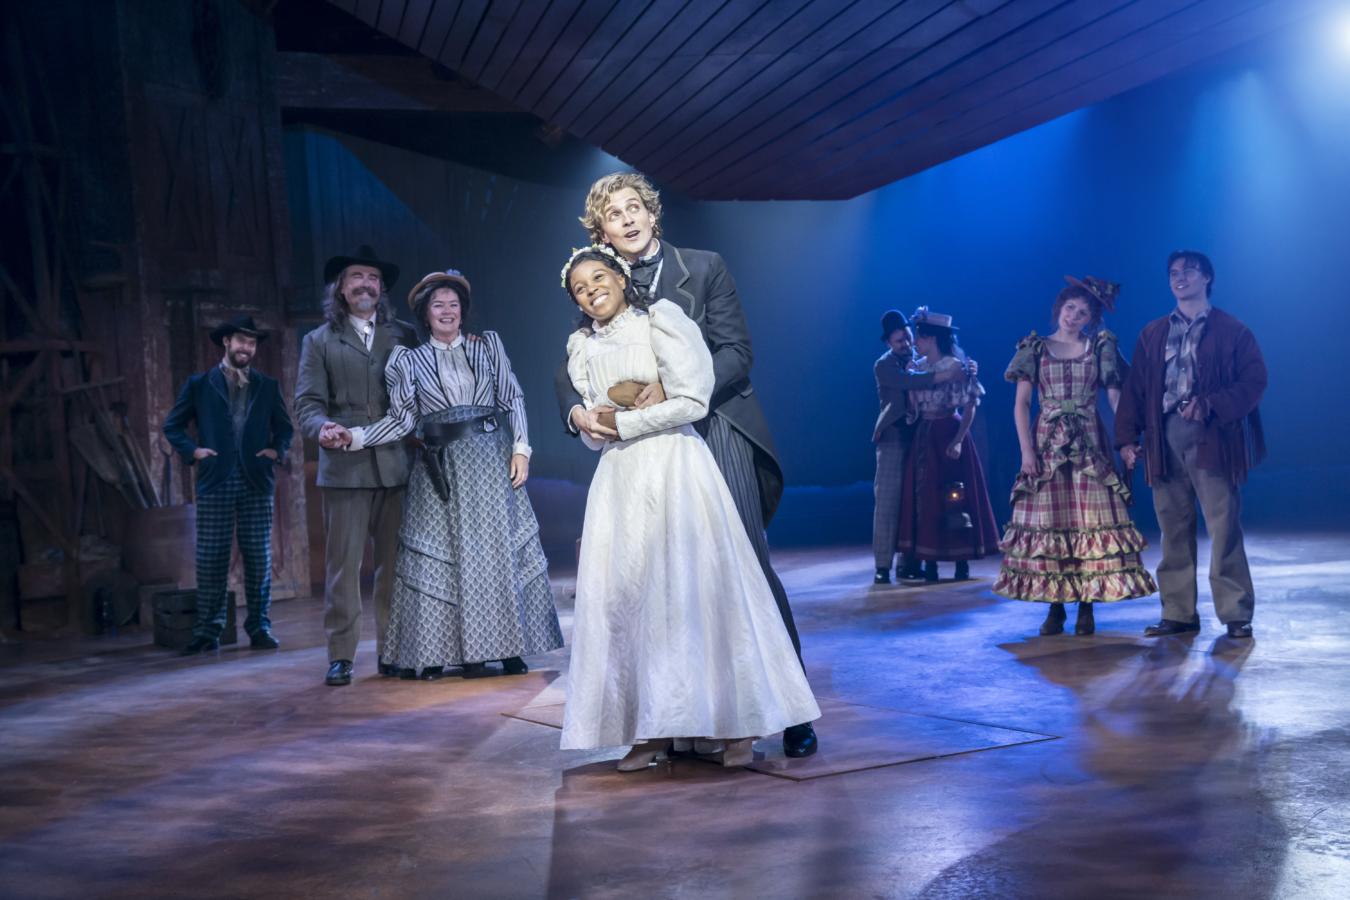 Amara-Okereke-Hyoie-O'Grady-members-of-the-company-in-OKLAHOMA-at-Chichester-Festival-Theatre-Photo-Jo.jpg